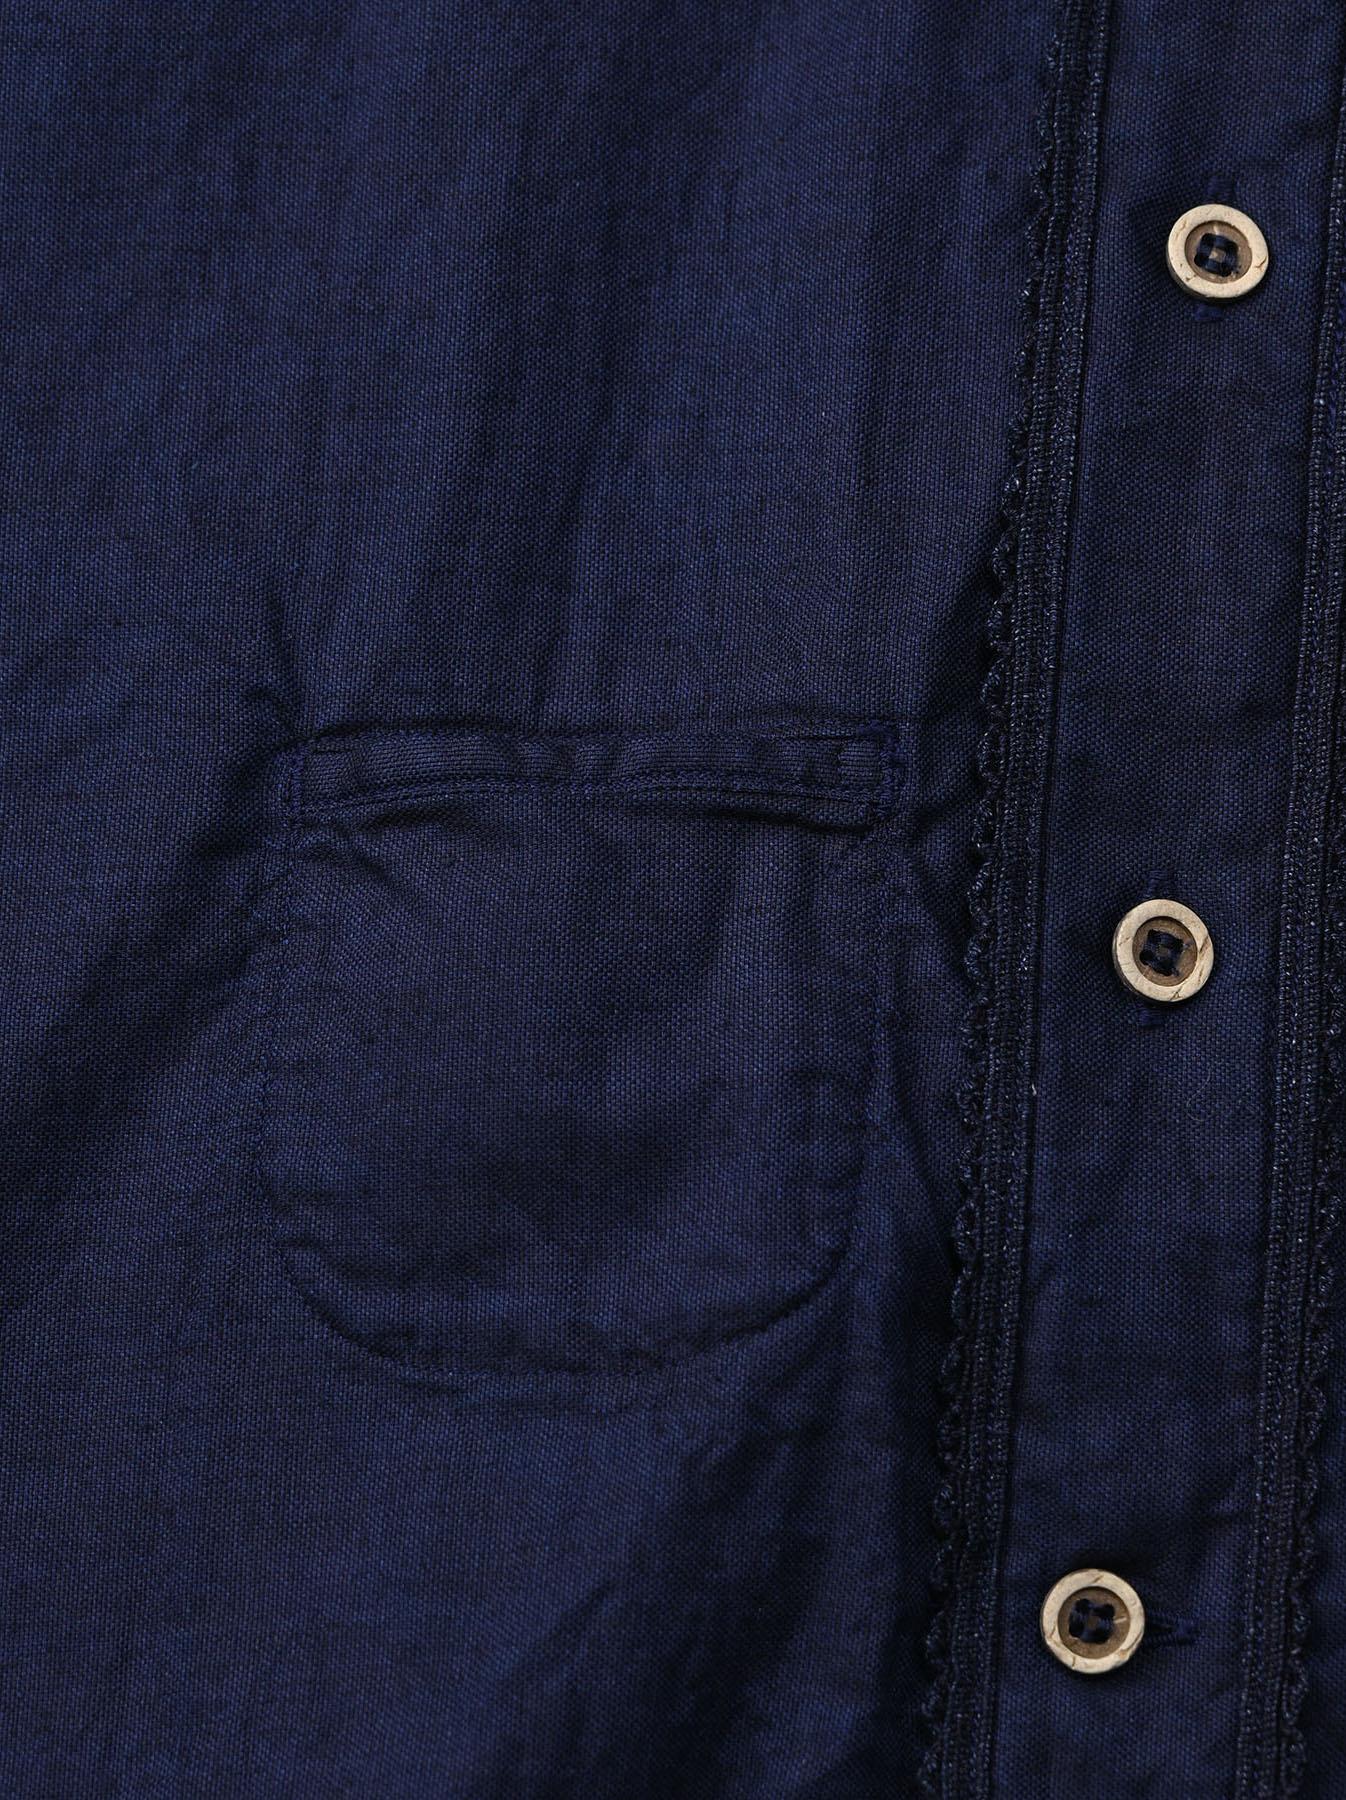 Indigo Thin Oxford 908 Ocean Lace Shirt (0621)-7